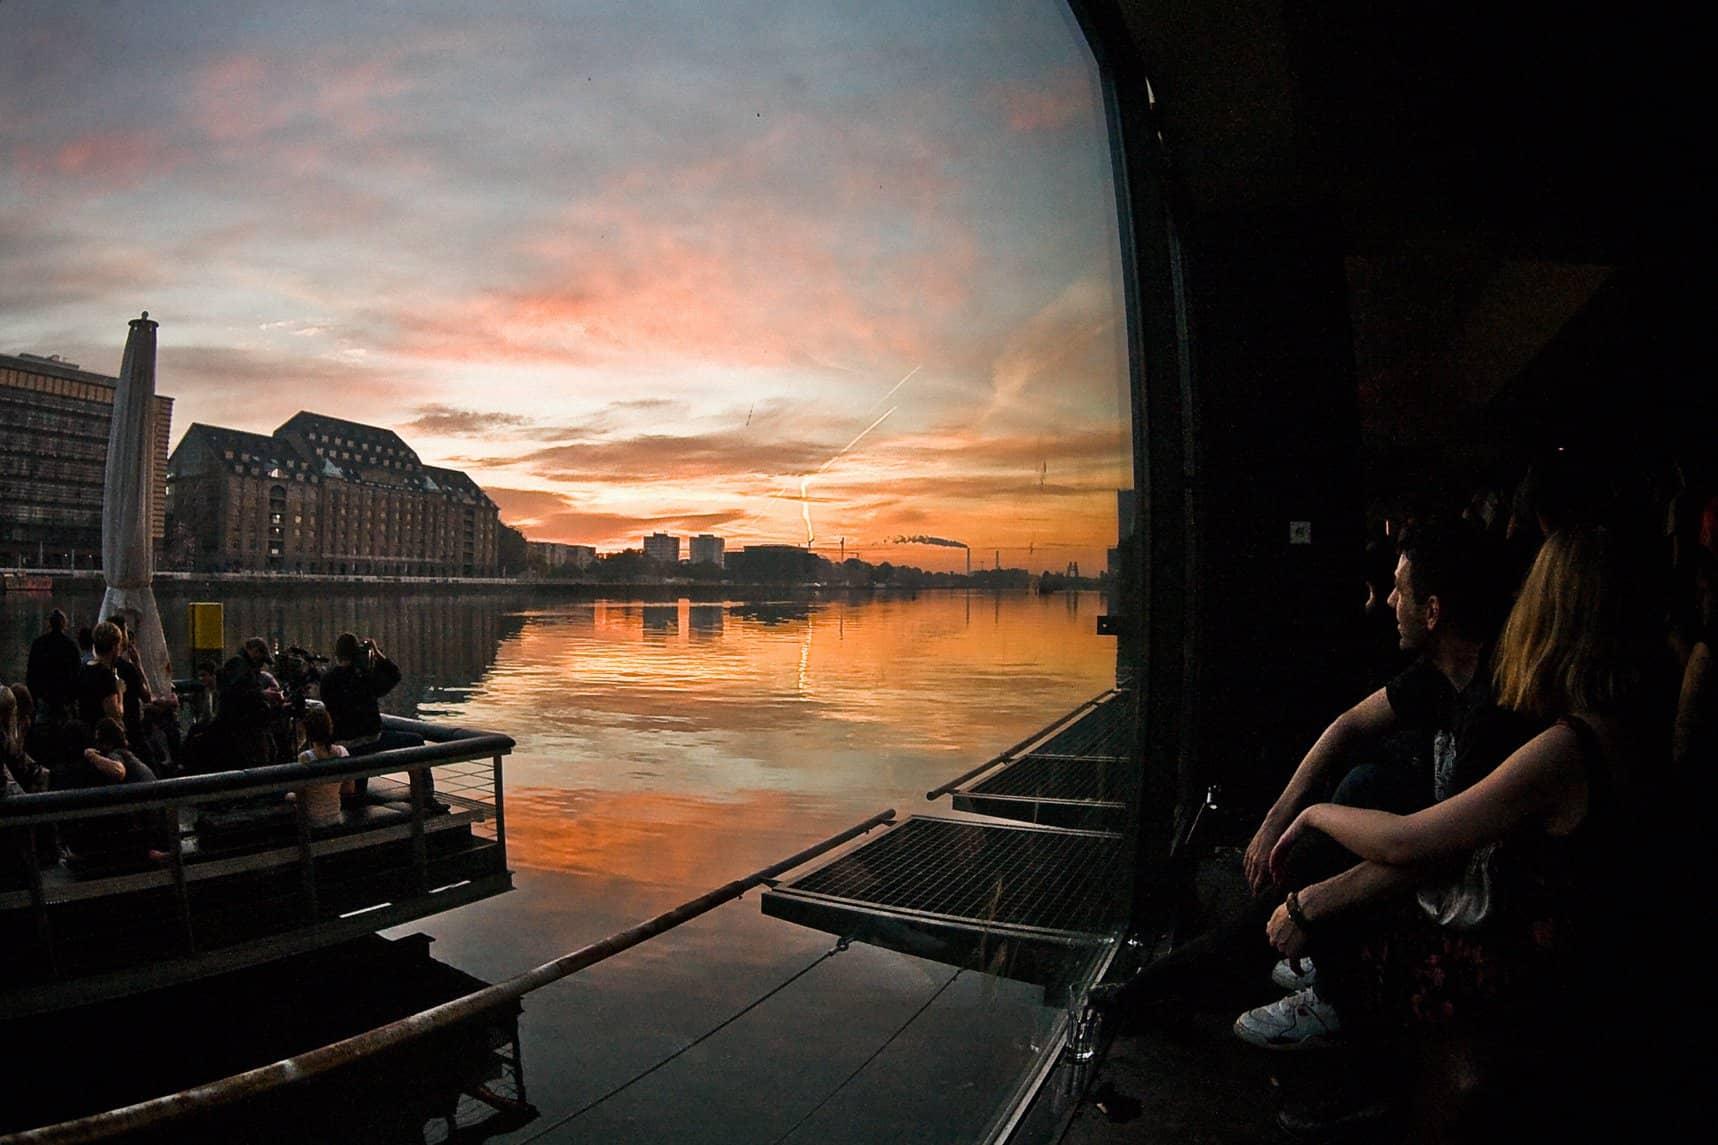 sunset-at-nightclub-watergate-in-berlin